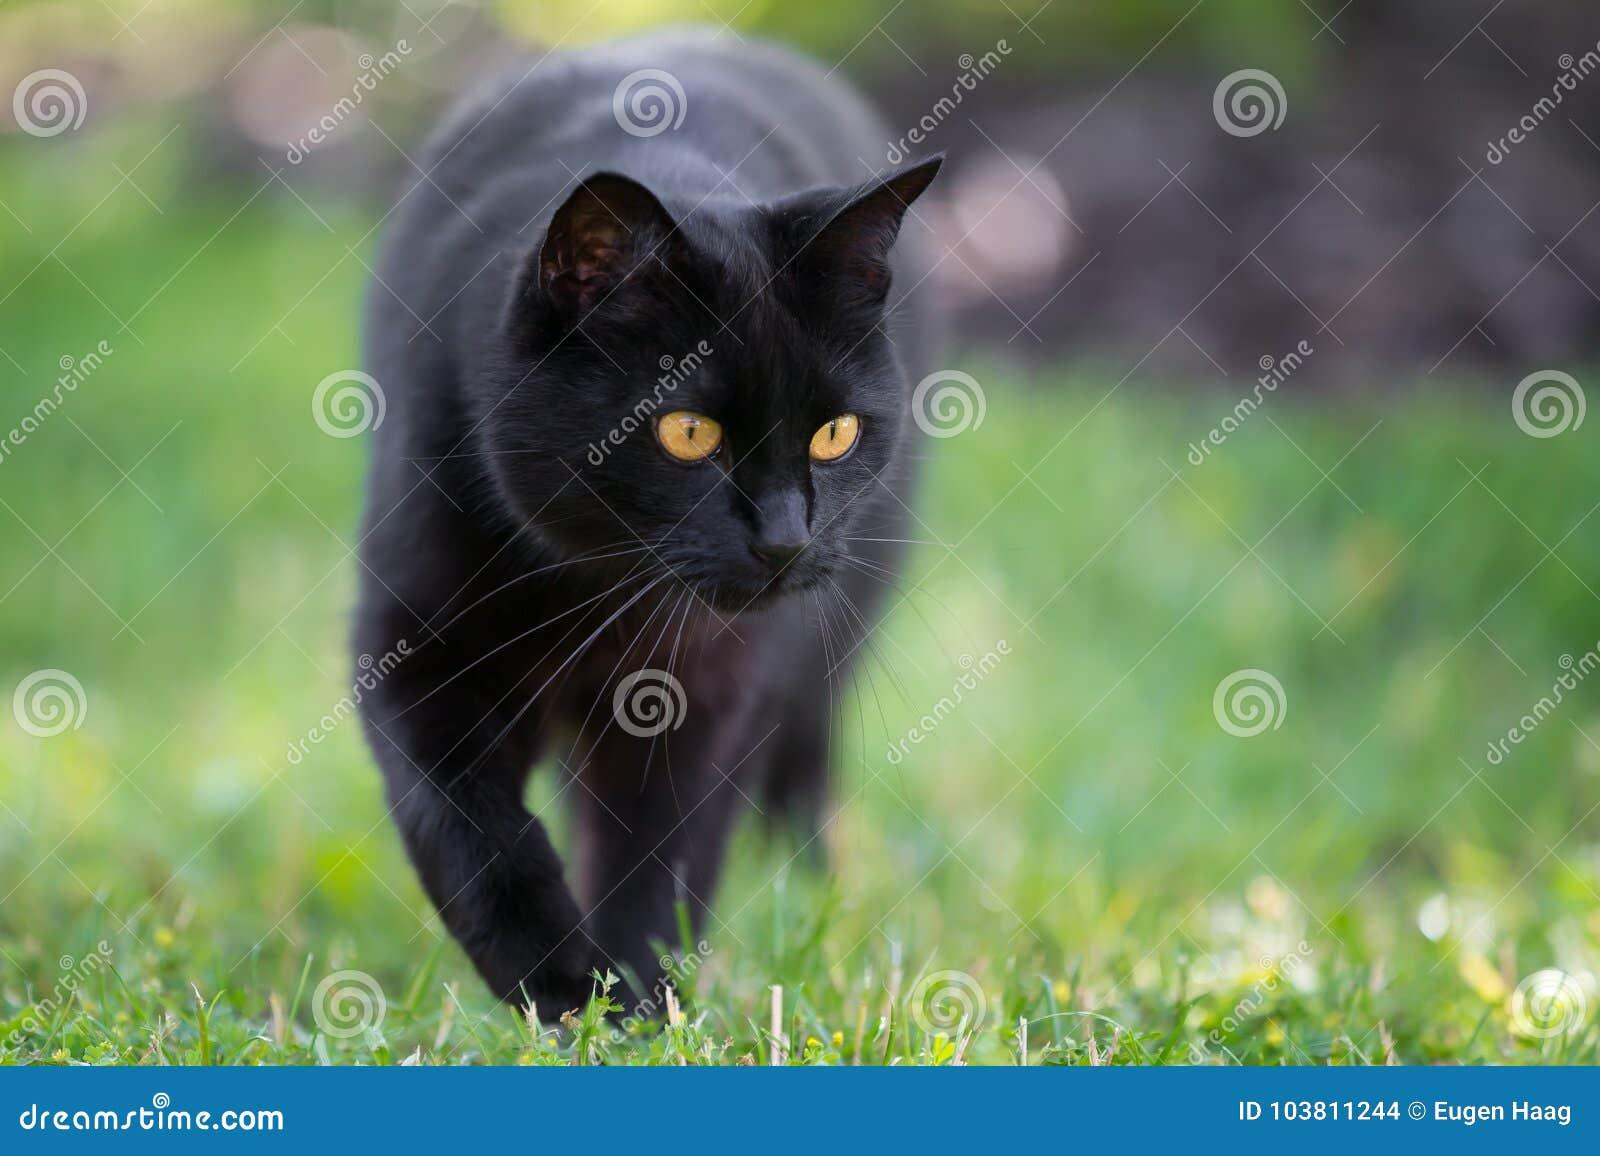 Black cat is walking through the grass